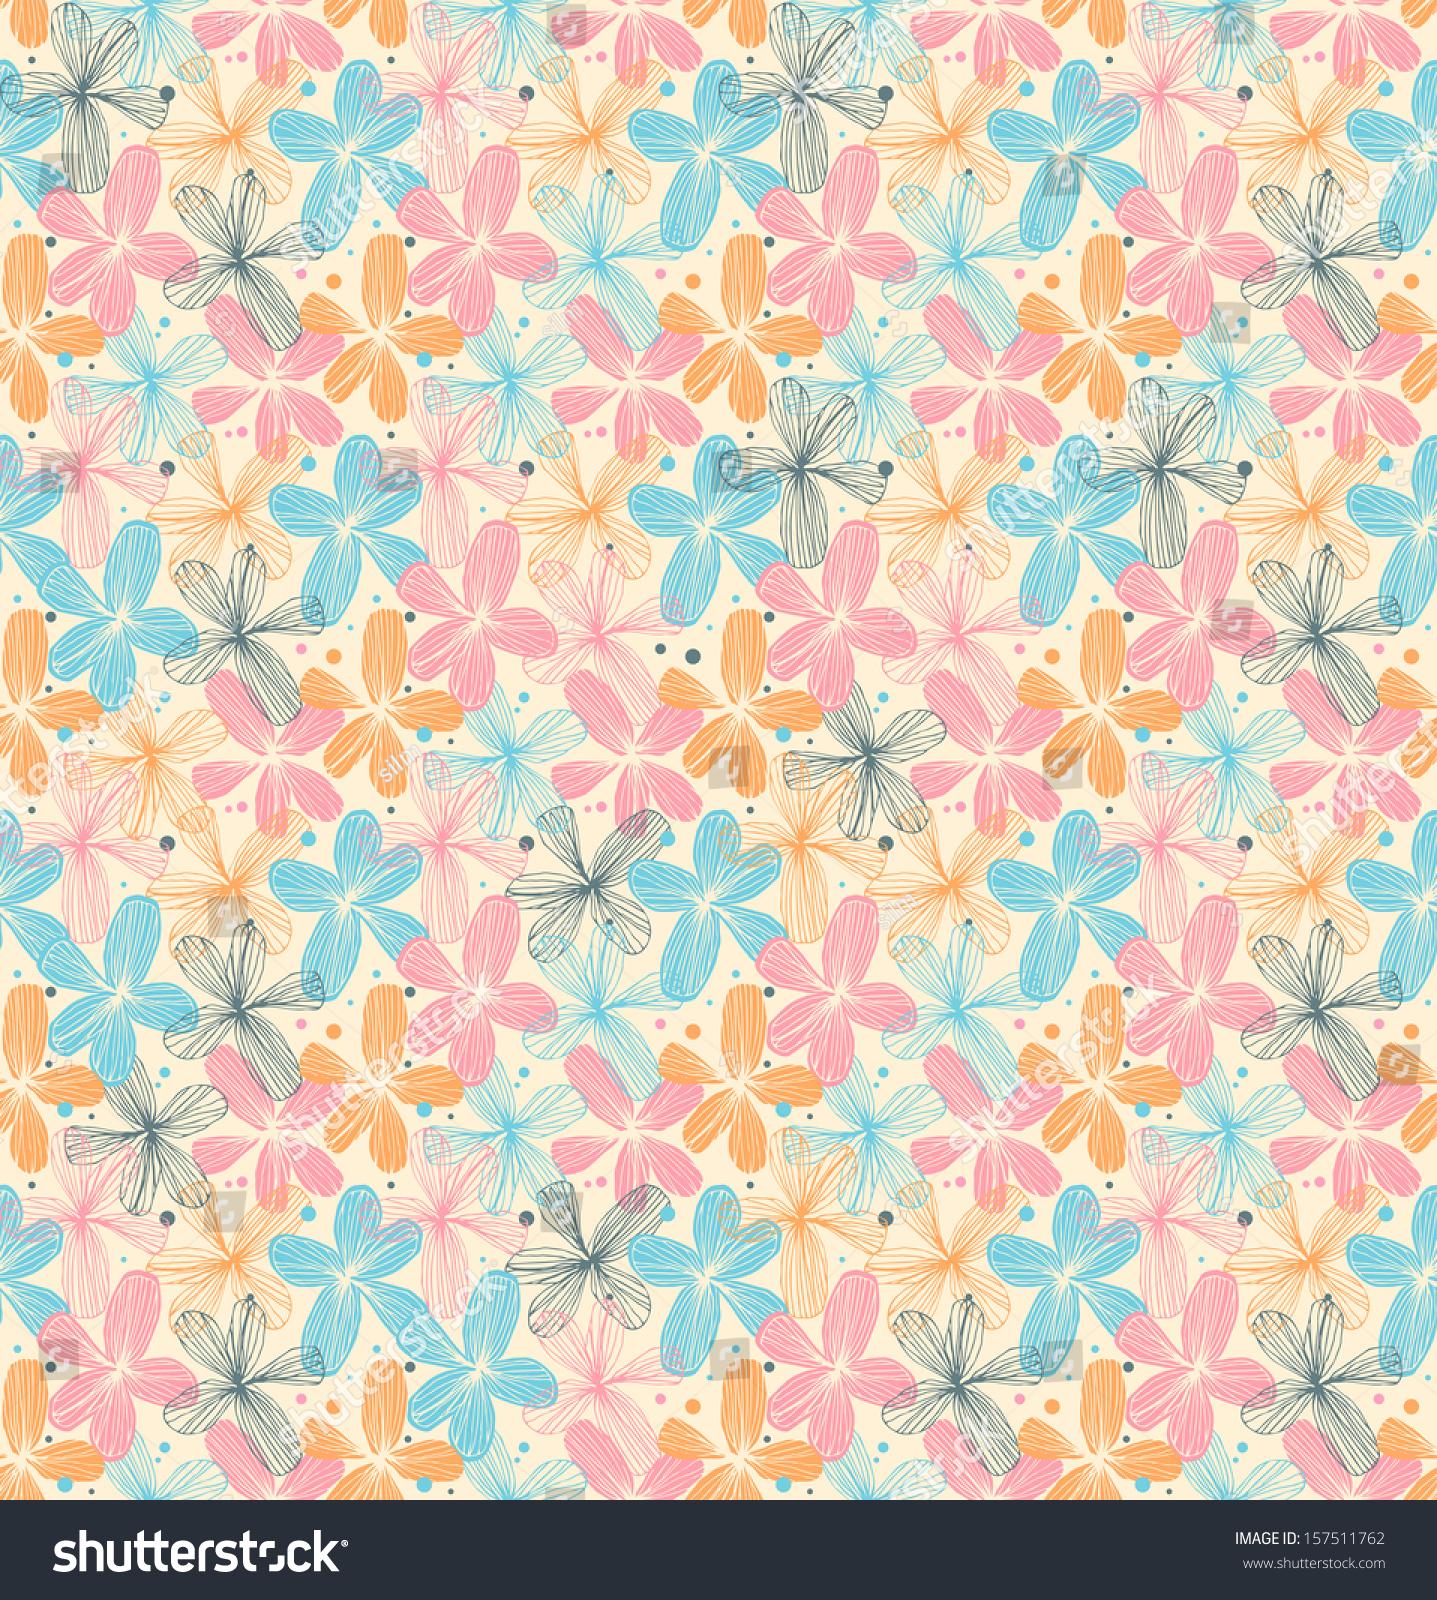 Vintage pastel pattern - photo#52